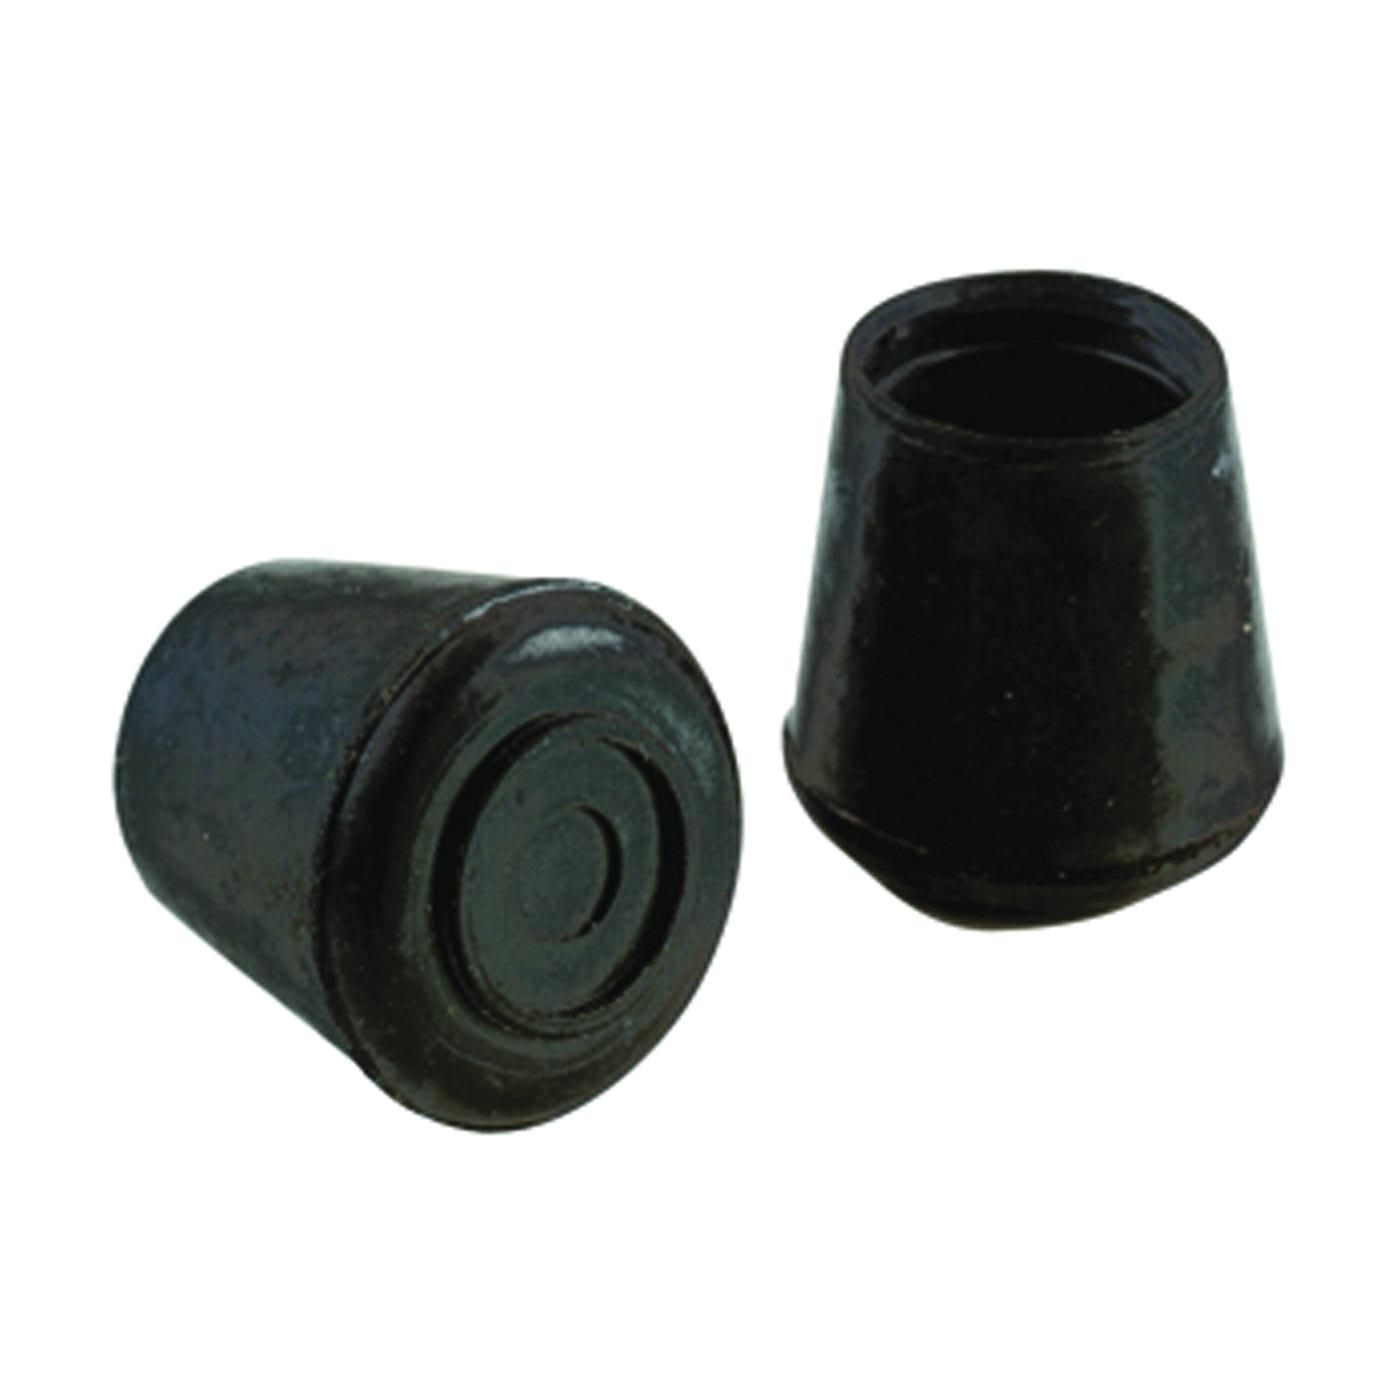 Picture of Shepherd Hardware 9129 Furniture Leg Tip, Round, Rubber, Black, 1-1/8 in Dia